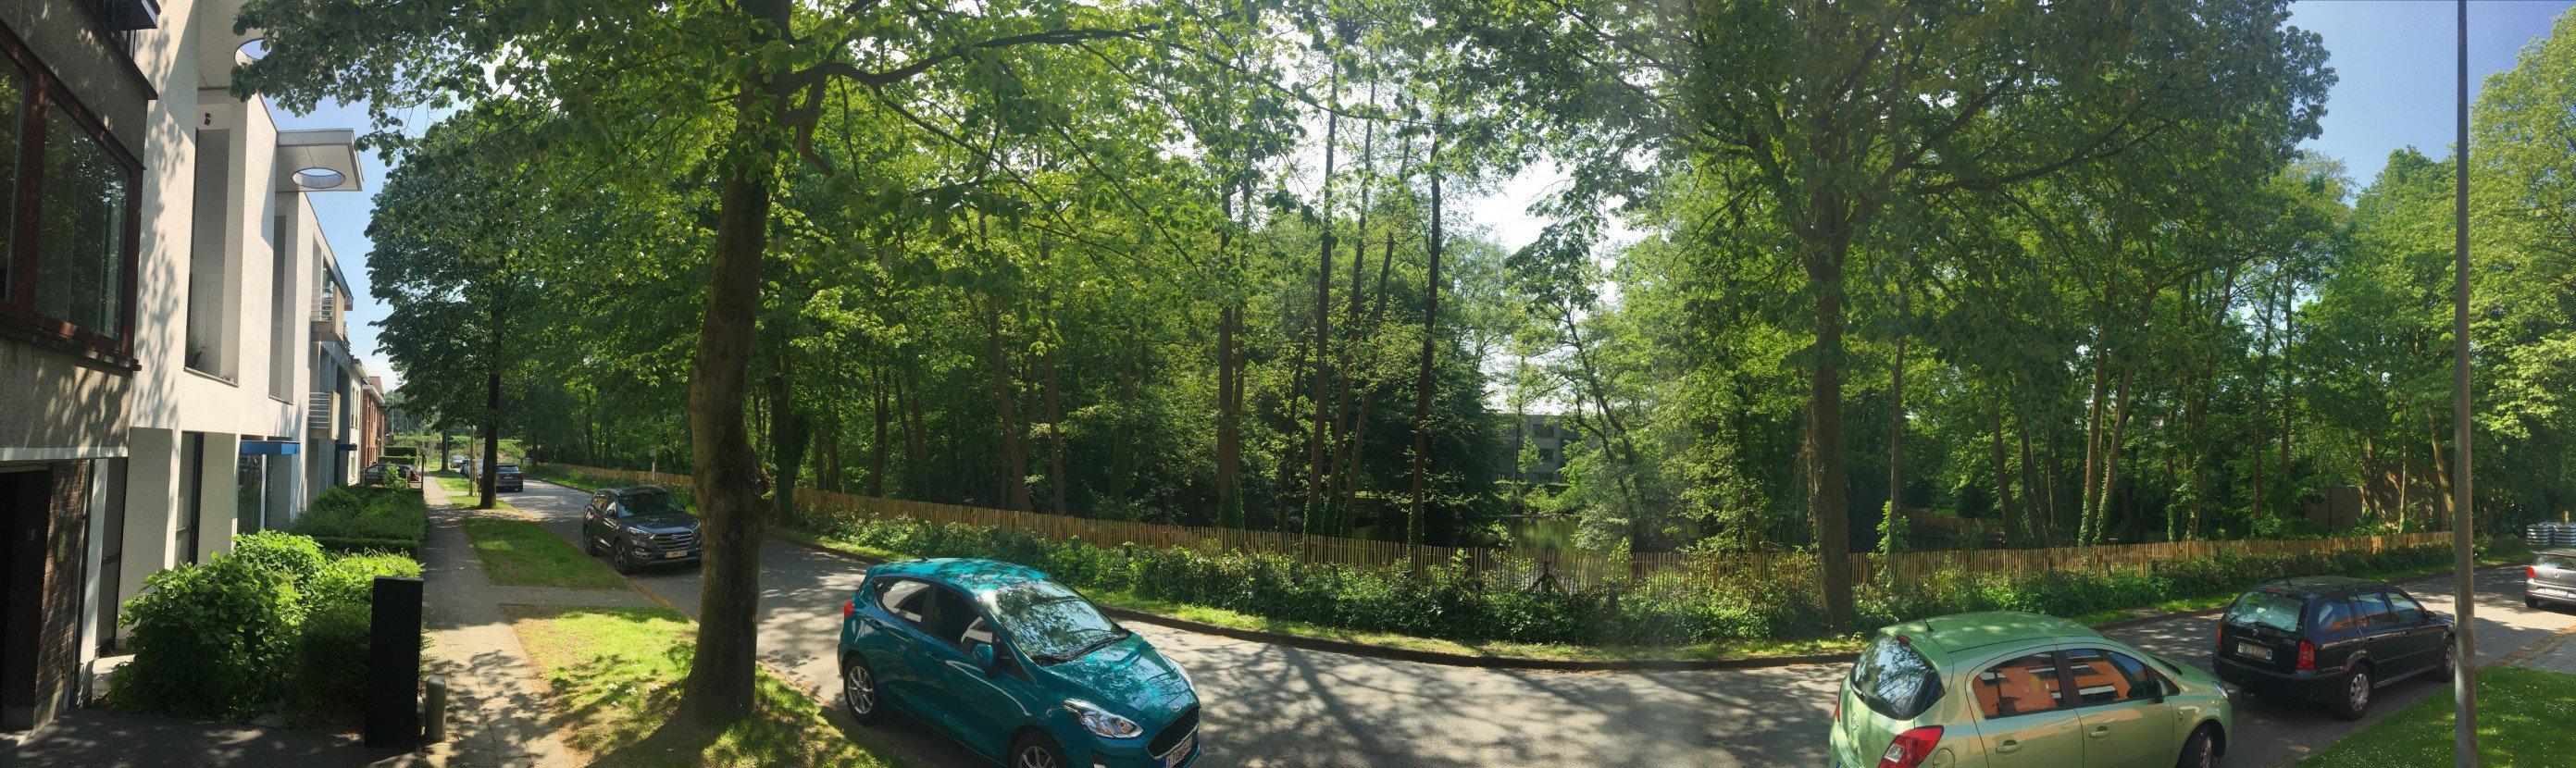 Rietveldprojects -Lieven-Parklaan10